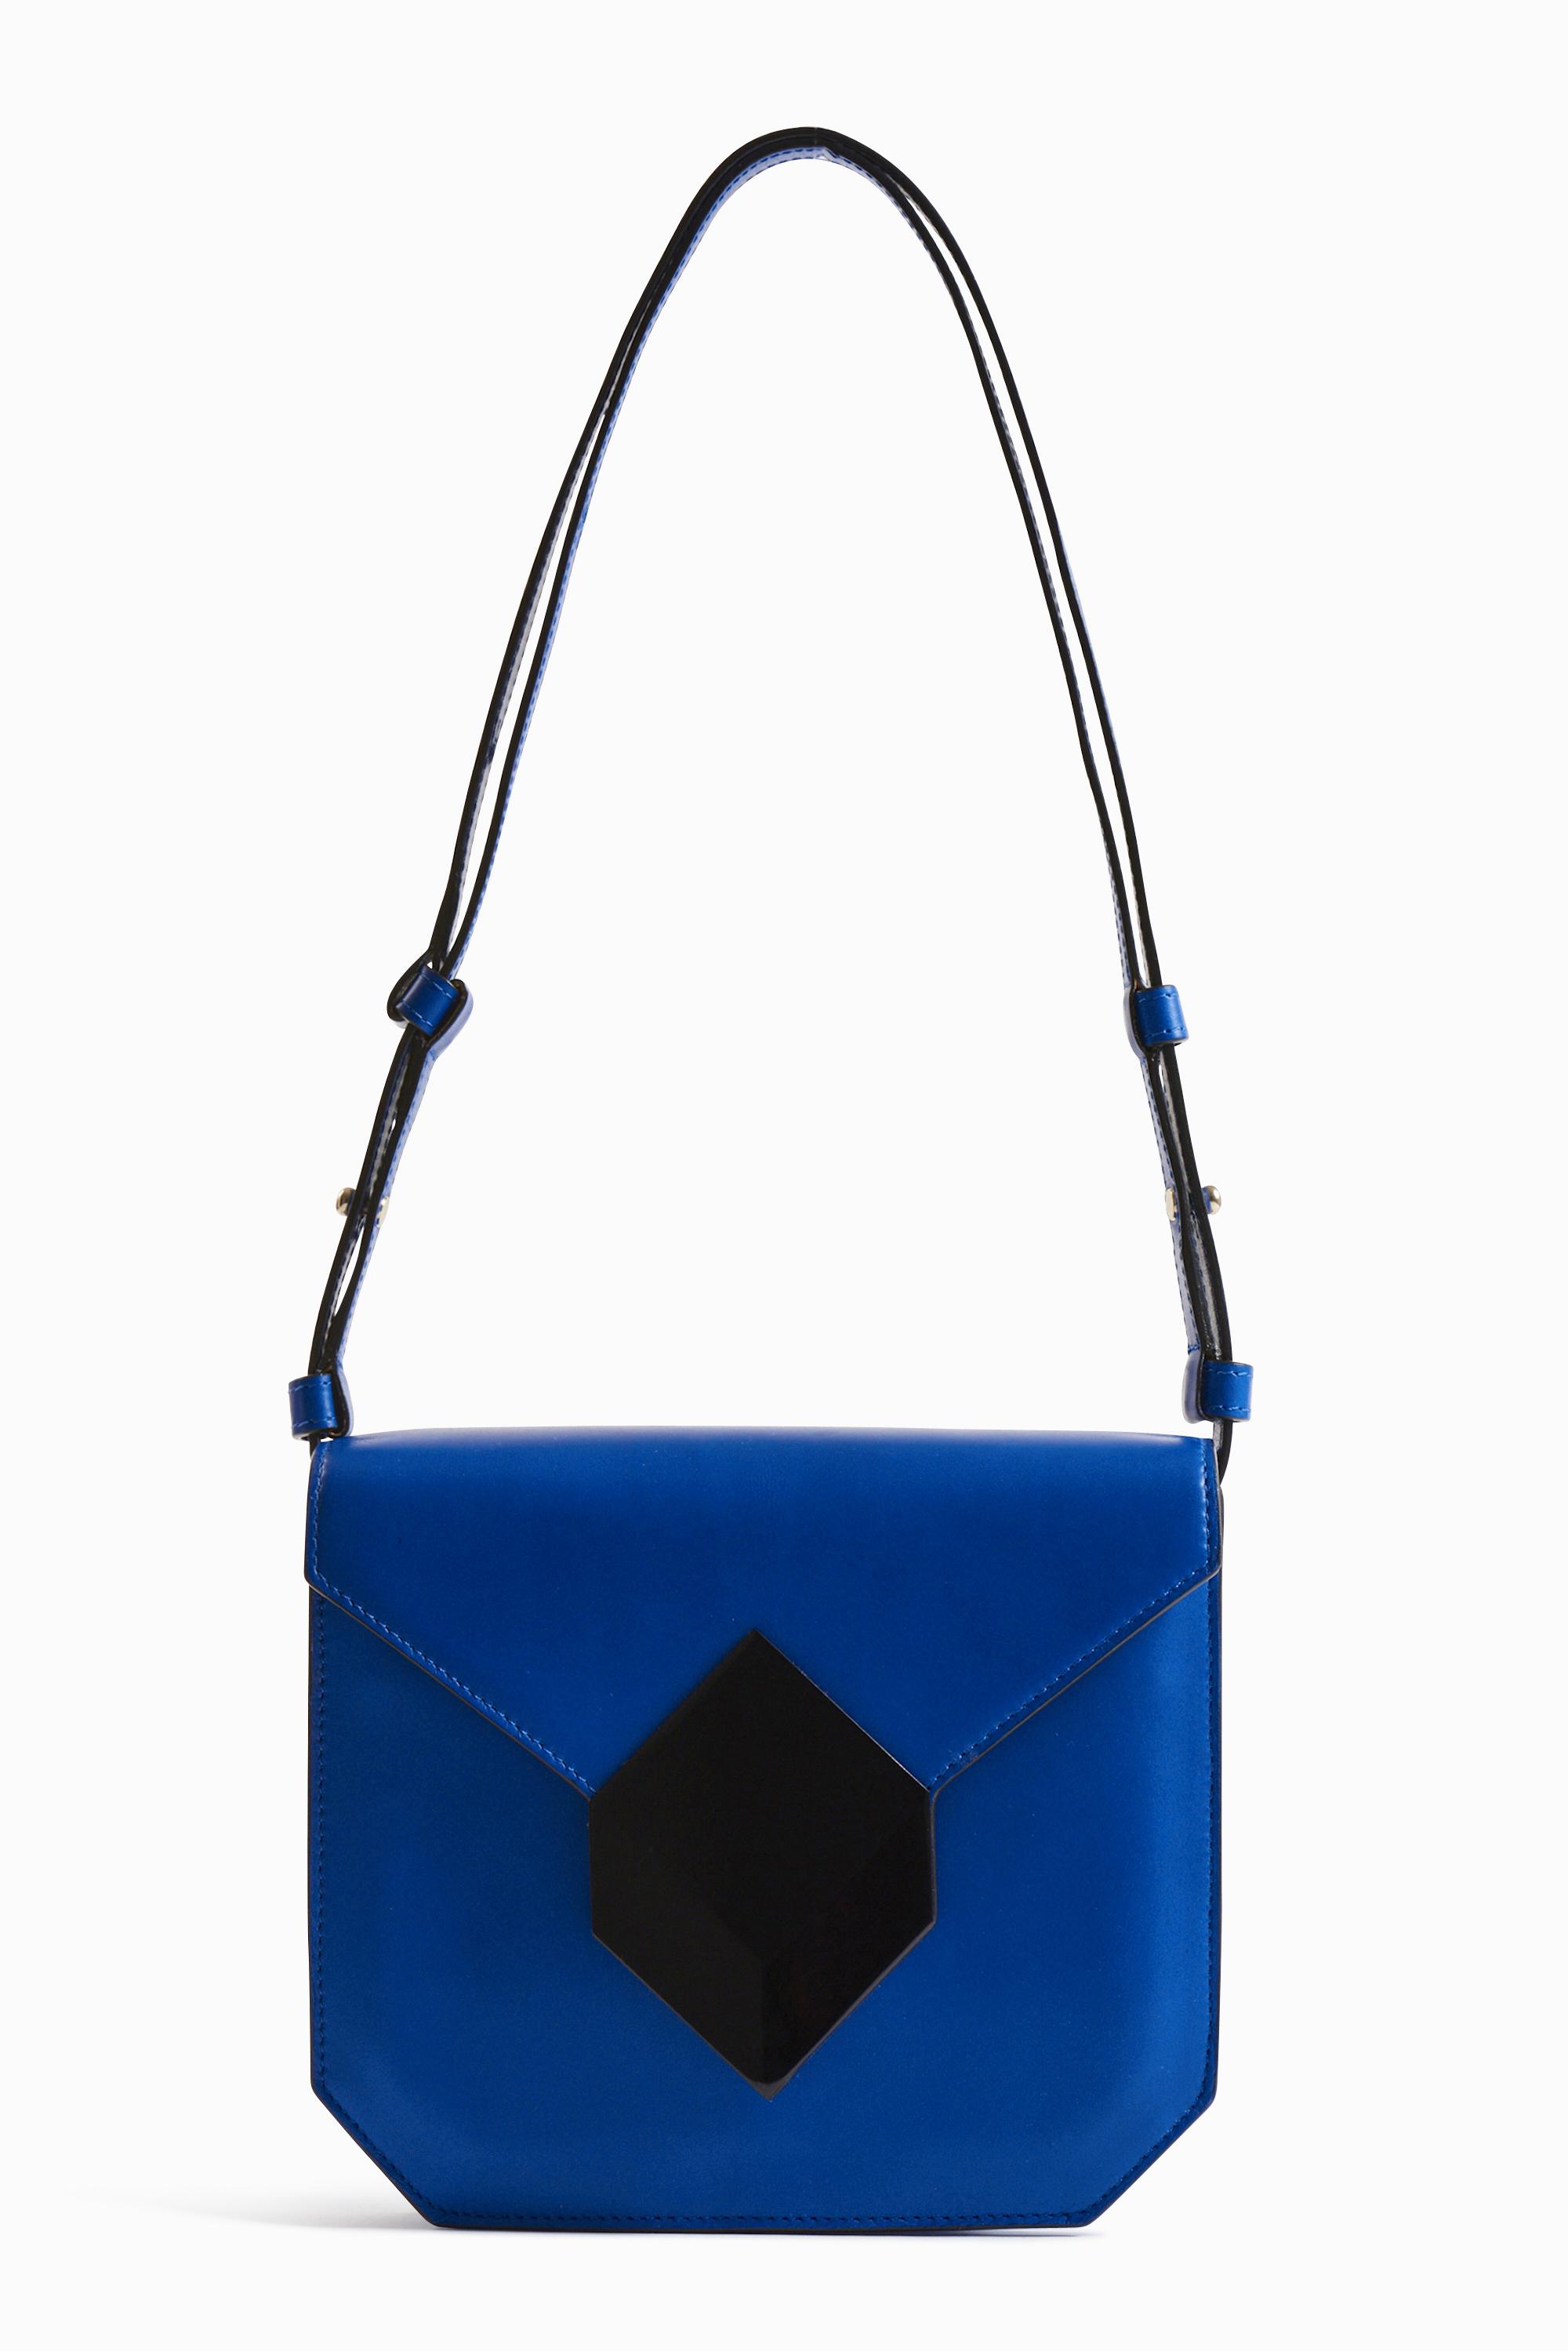 "Sac ""Prism"" en cuir bleu avec rabat fermoir Cube Perspective en métal noir, PIERRE HARDY."